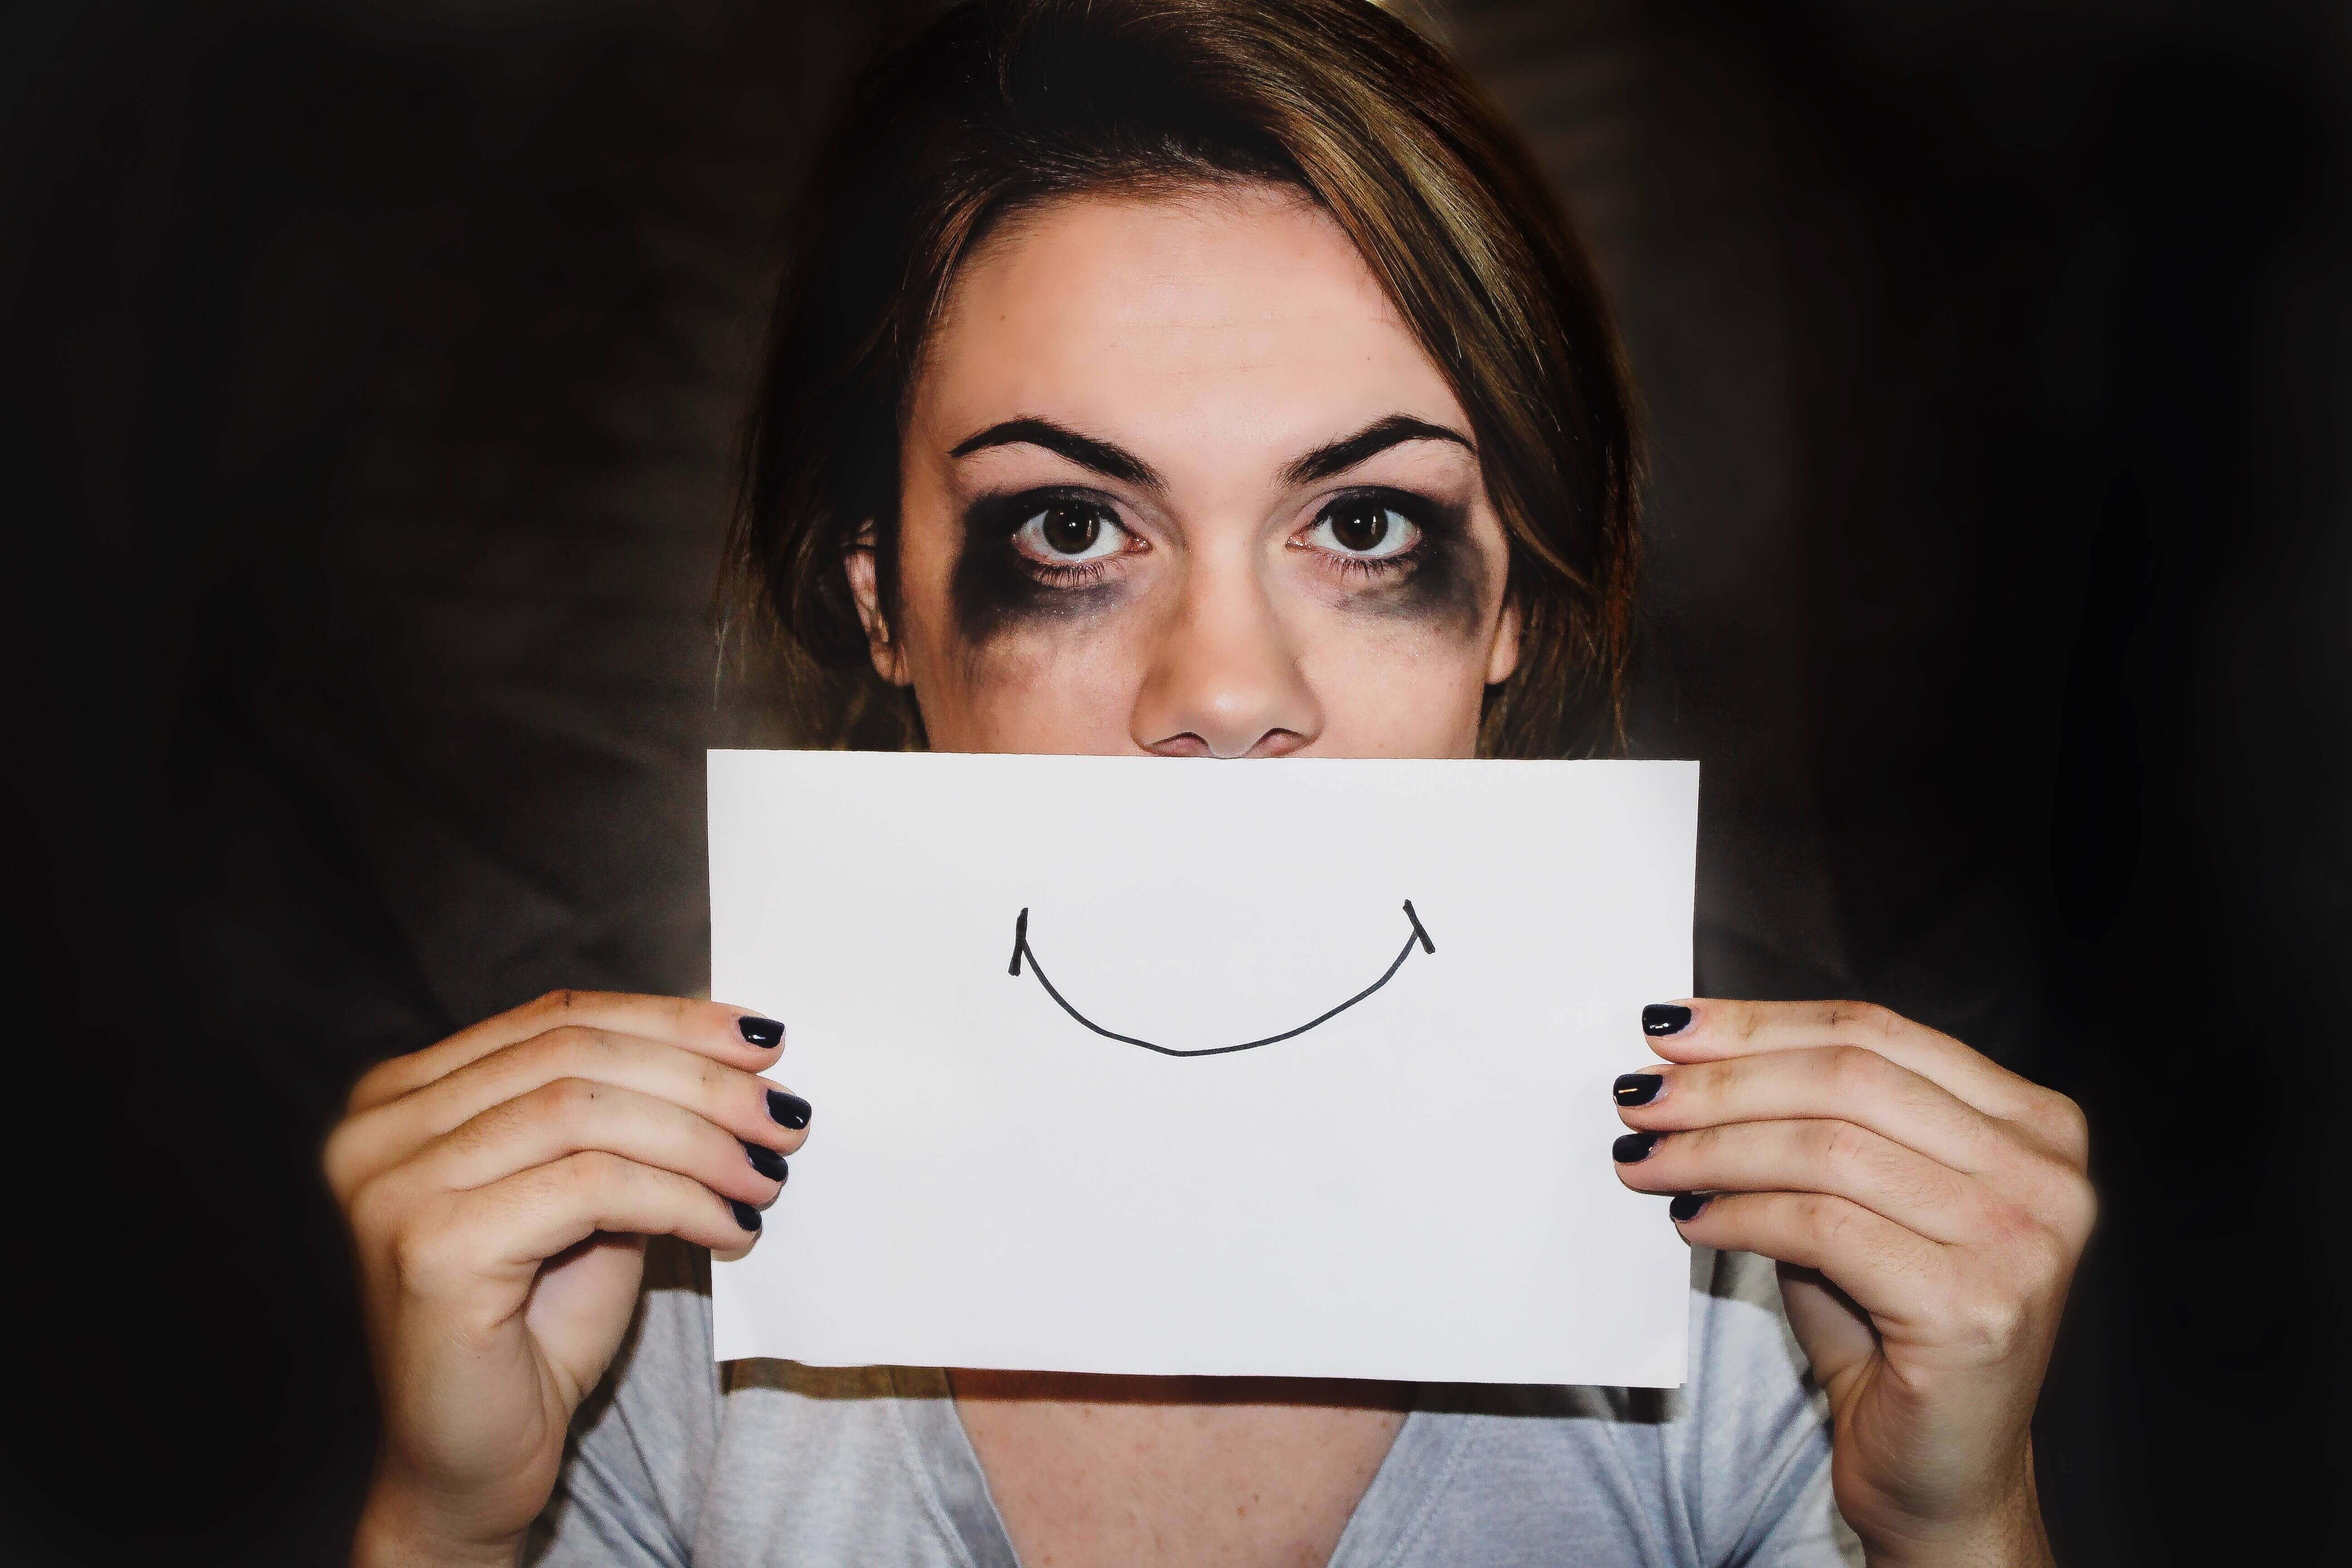 angst vor negativen gedanken